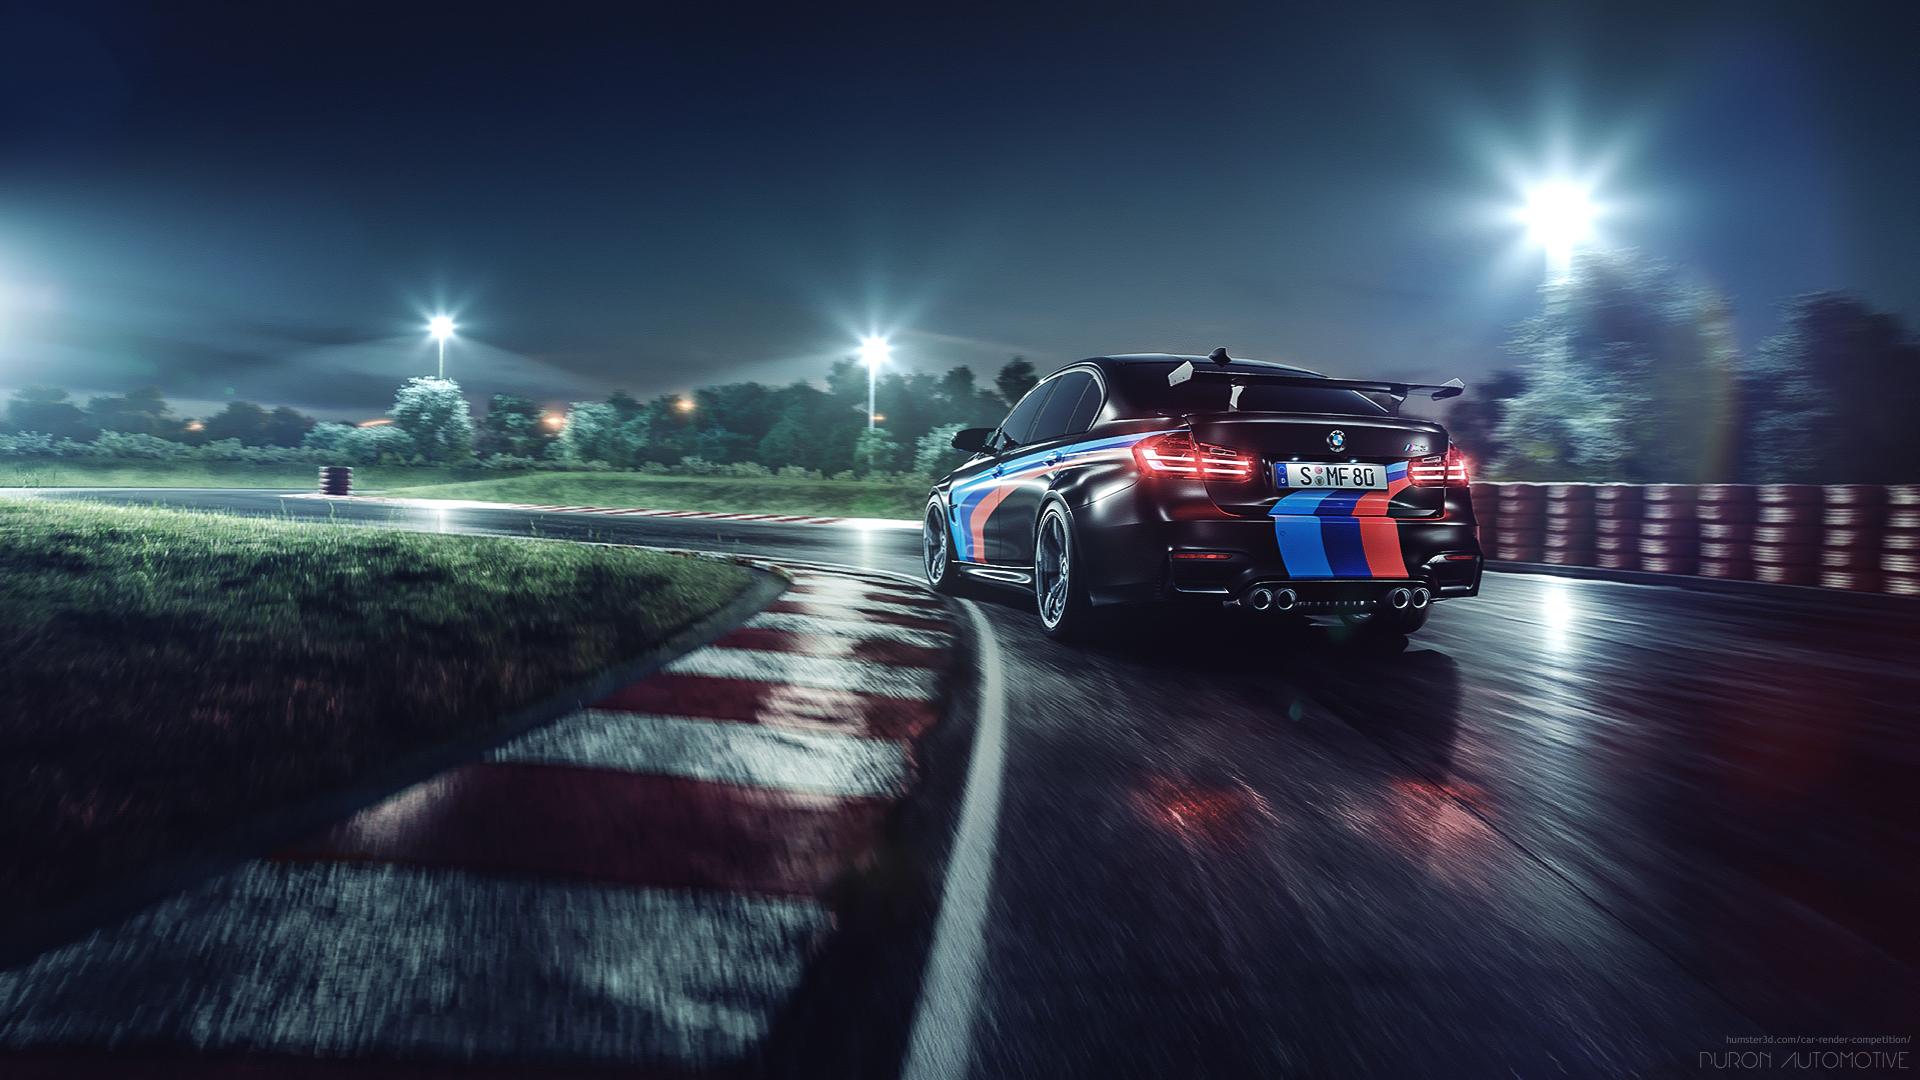 BMW M3 F80 (GTS replica) Full-CG Circuit 3d art